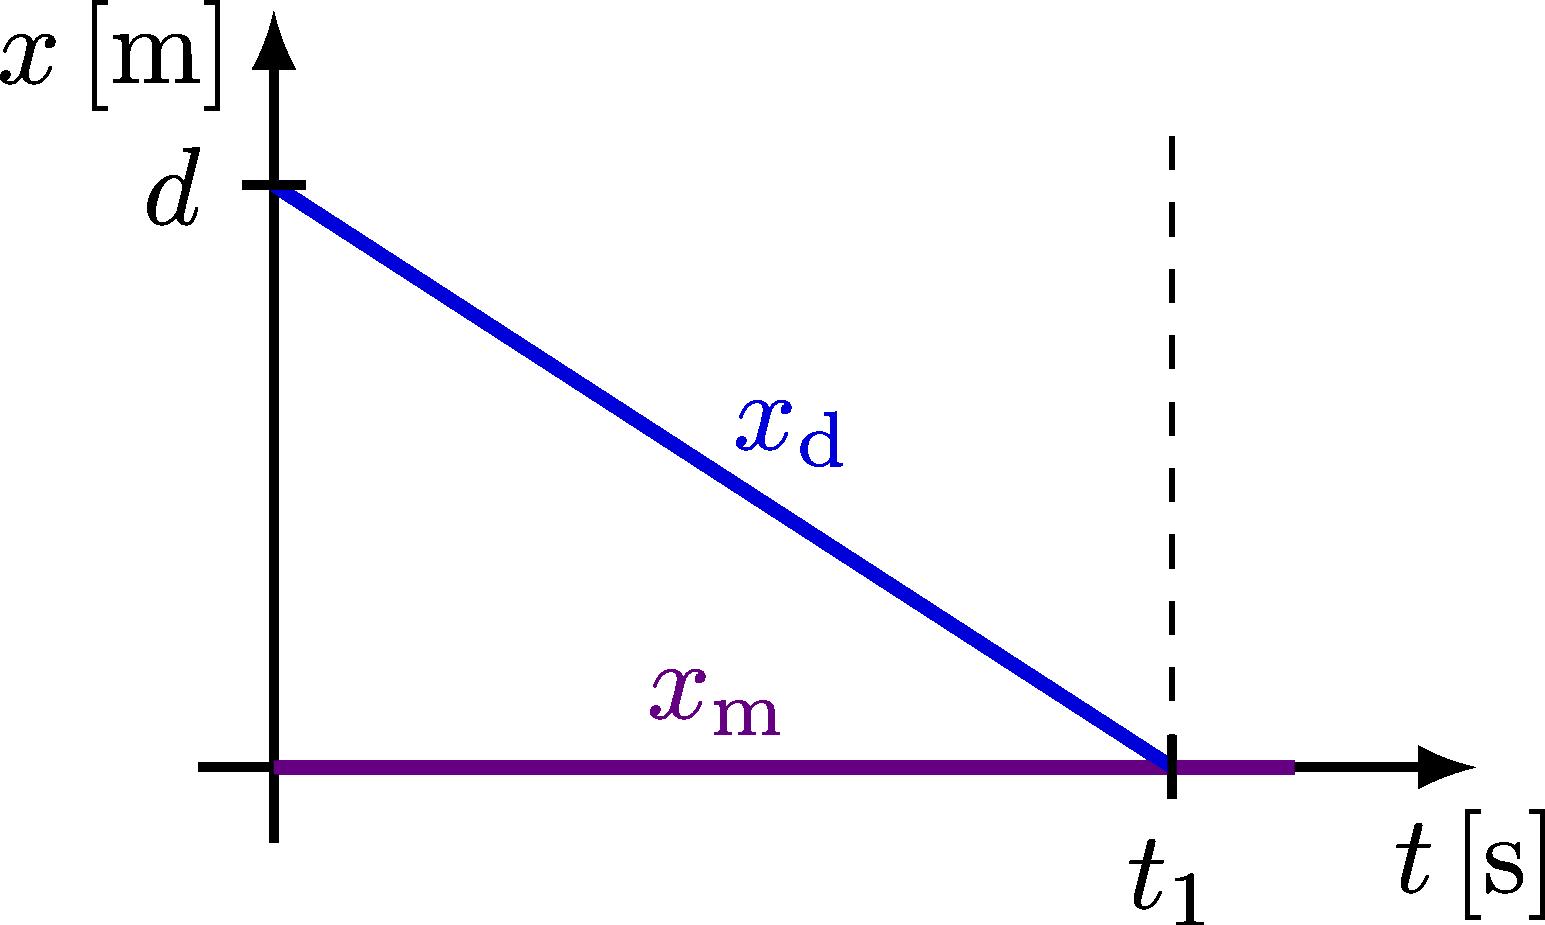 kinematics_trajectory_monkey-003.png